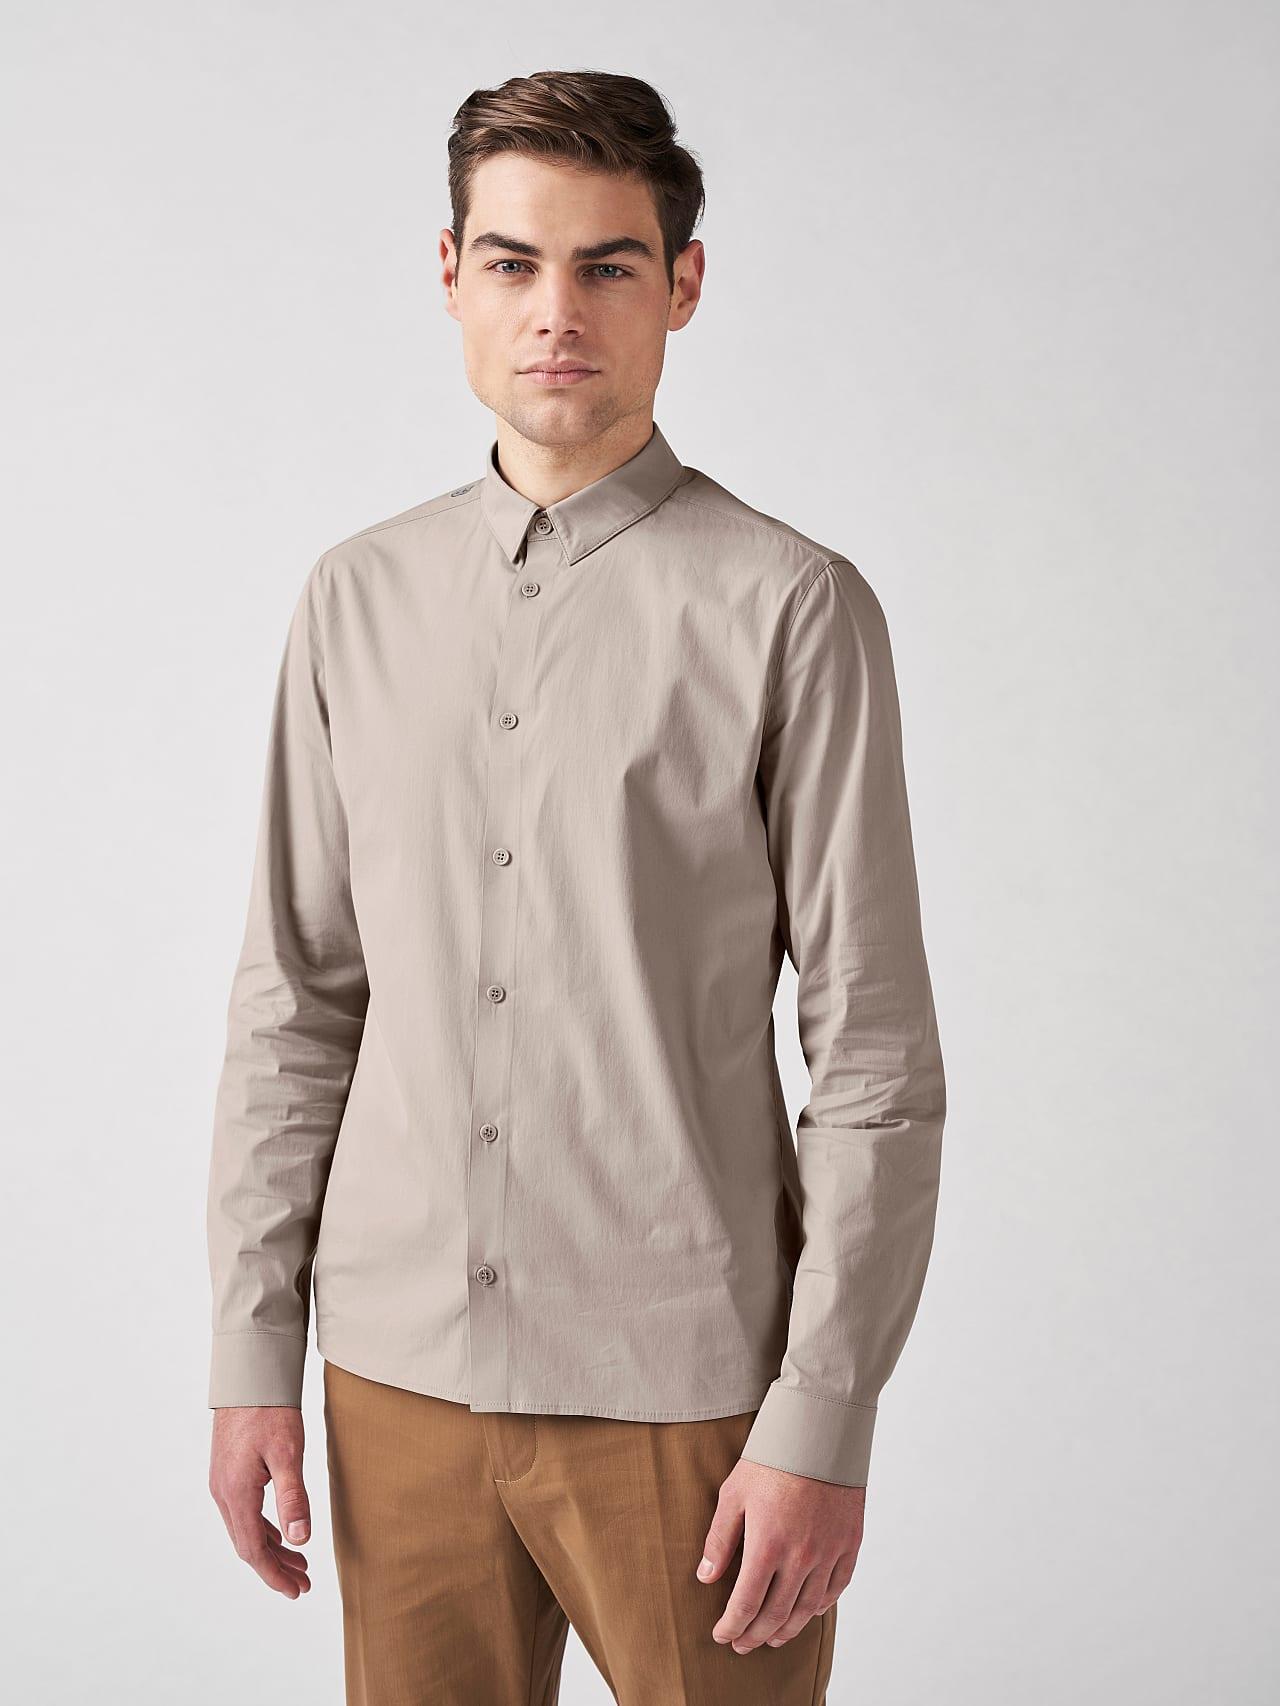 WAARG V1.Y5.01 Cotton-Stretch Shirt Sand Model shot Alpha Tauri